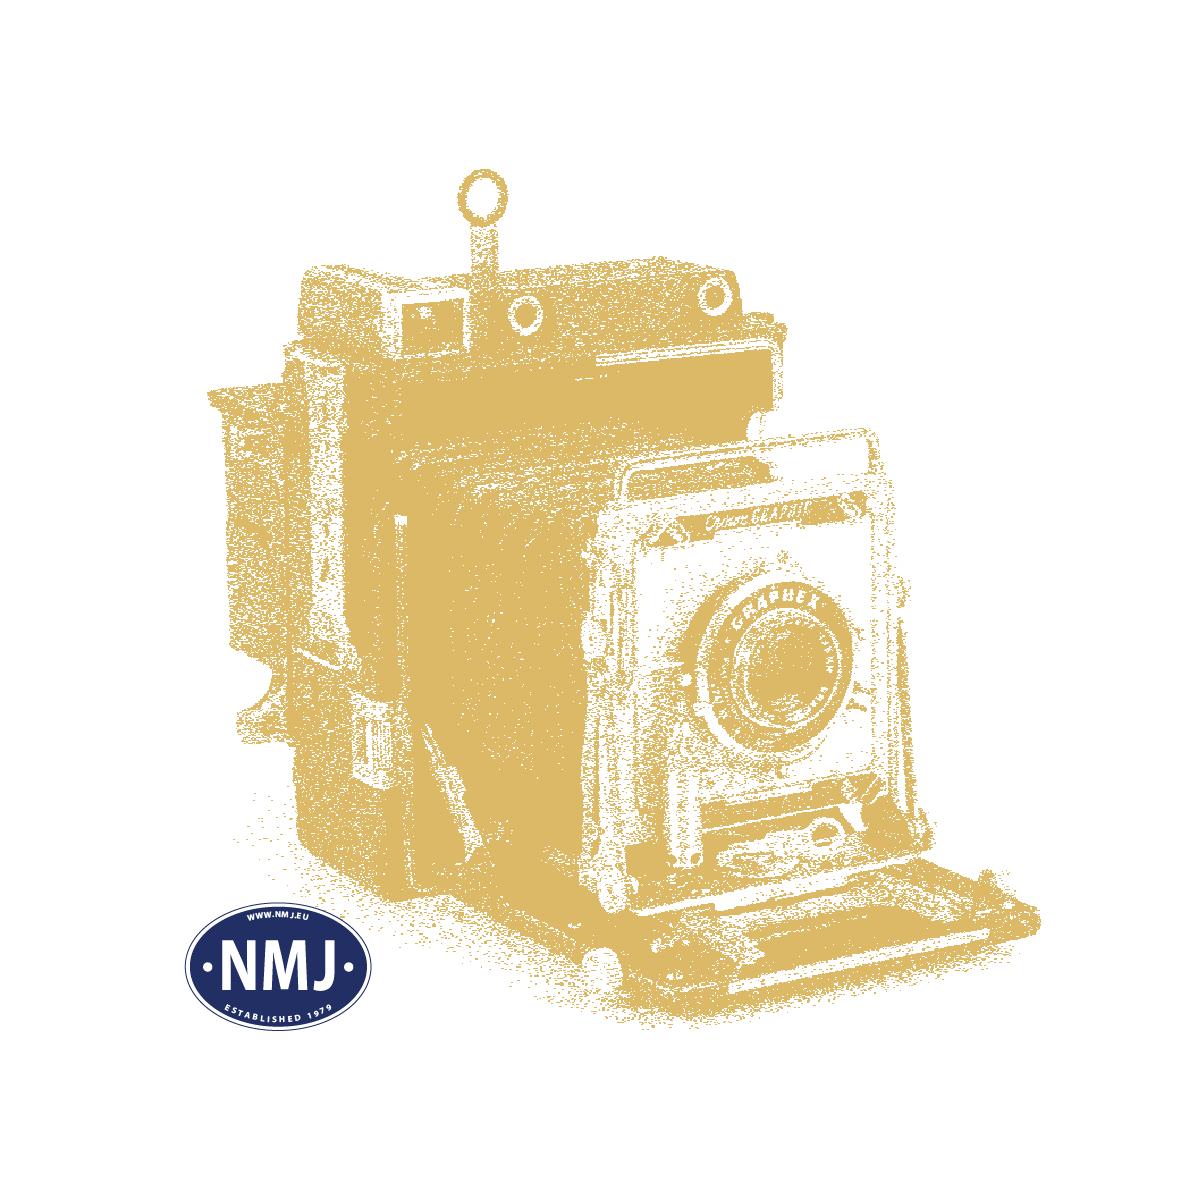 NMJ Topline NSB SKD224.216, Rød/gul, DCC Digital